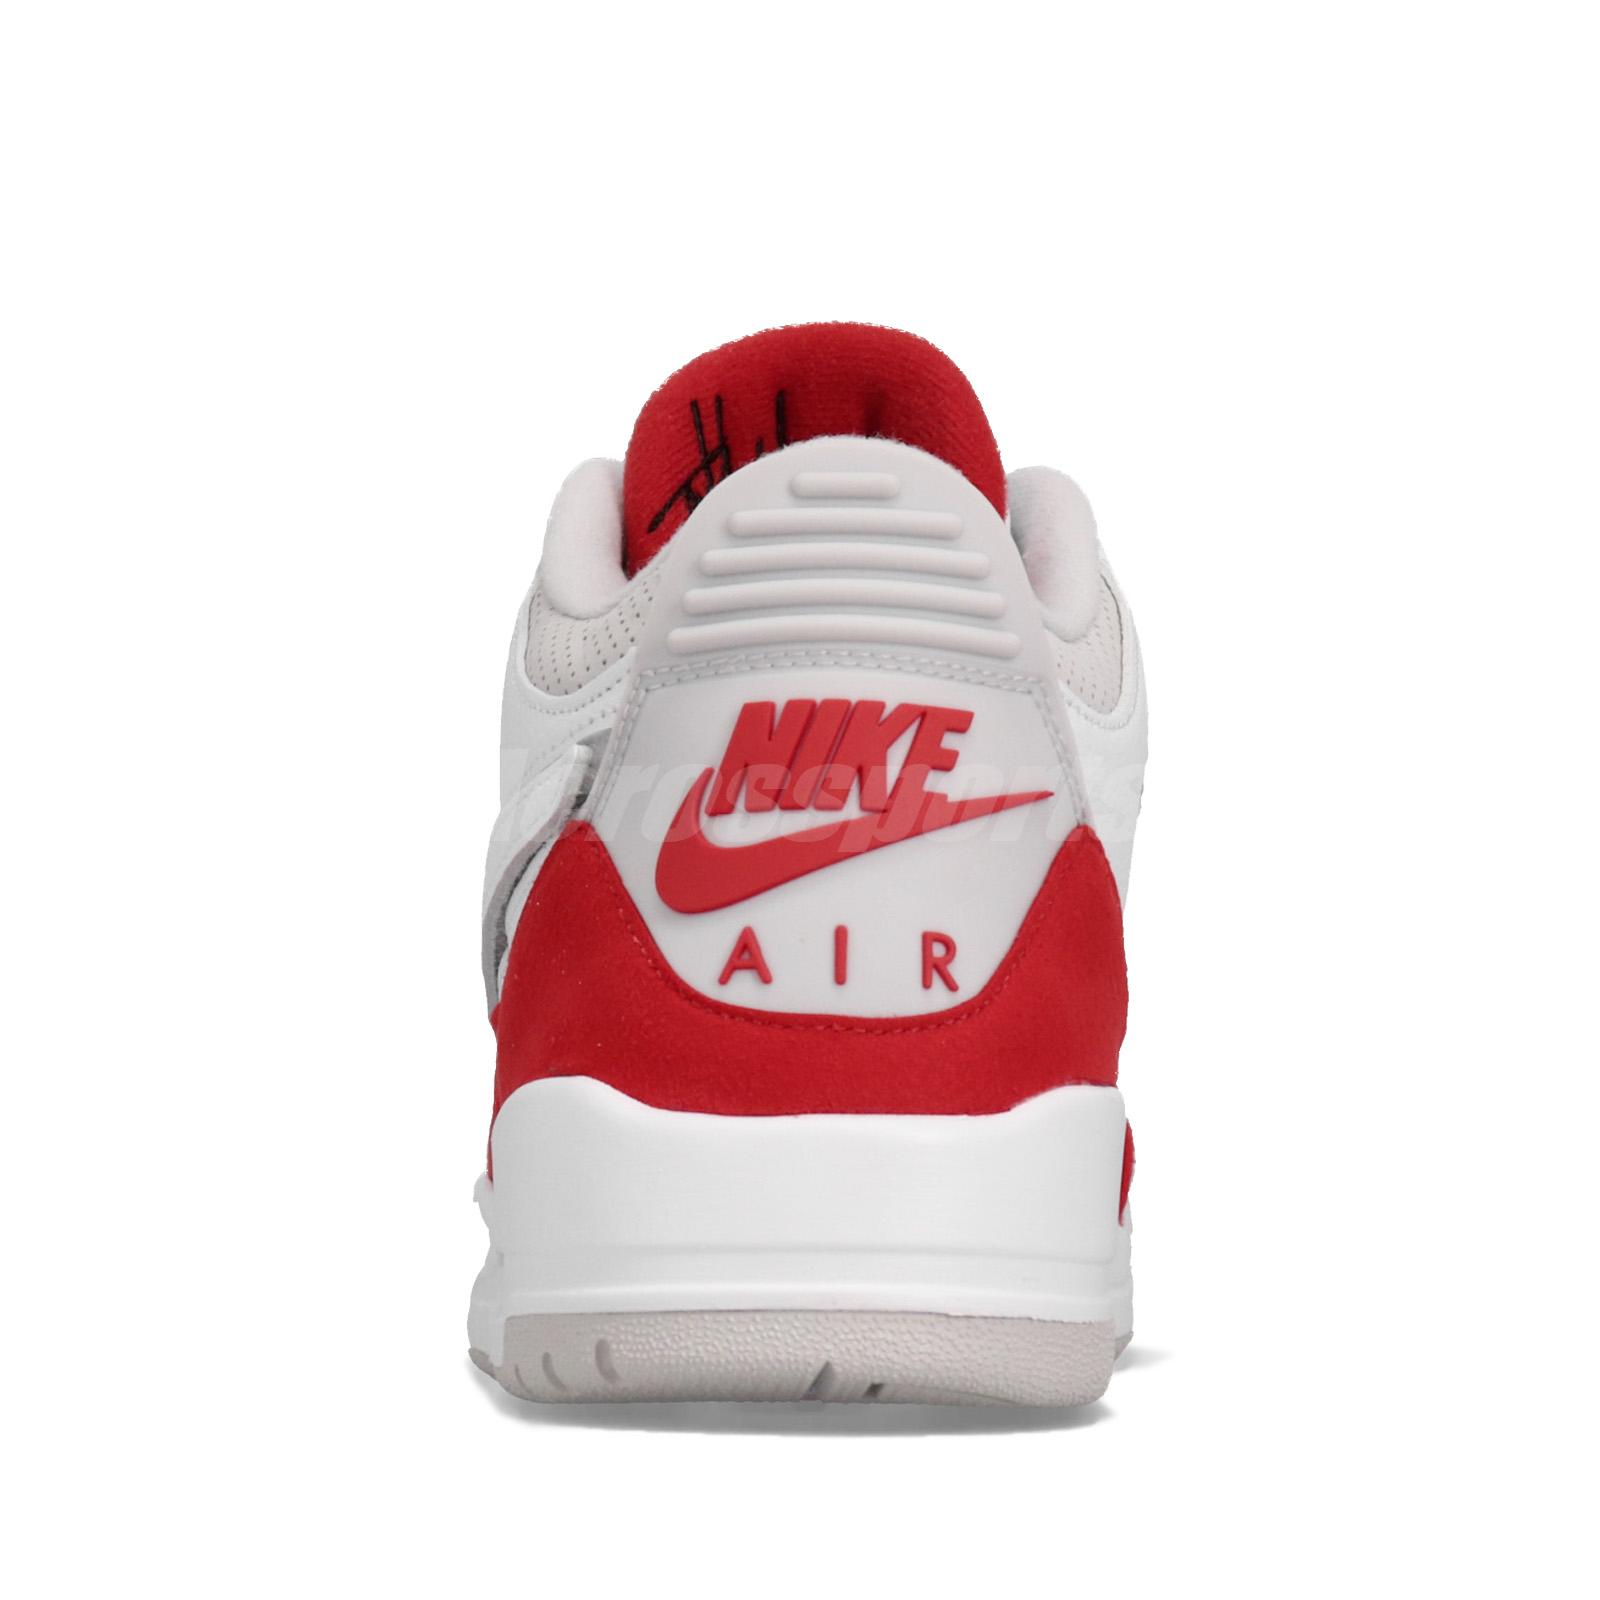 d06ee64e279419 Nike Air Jordan 3 Retro TH SP Tinker Hatfield Air Max 1 OG Red White ...